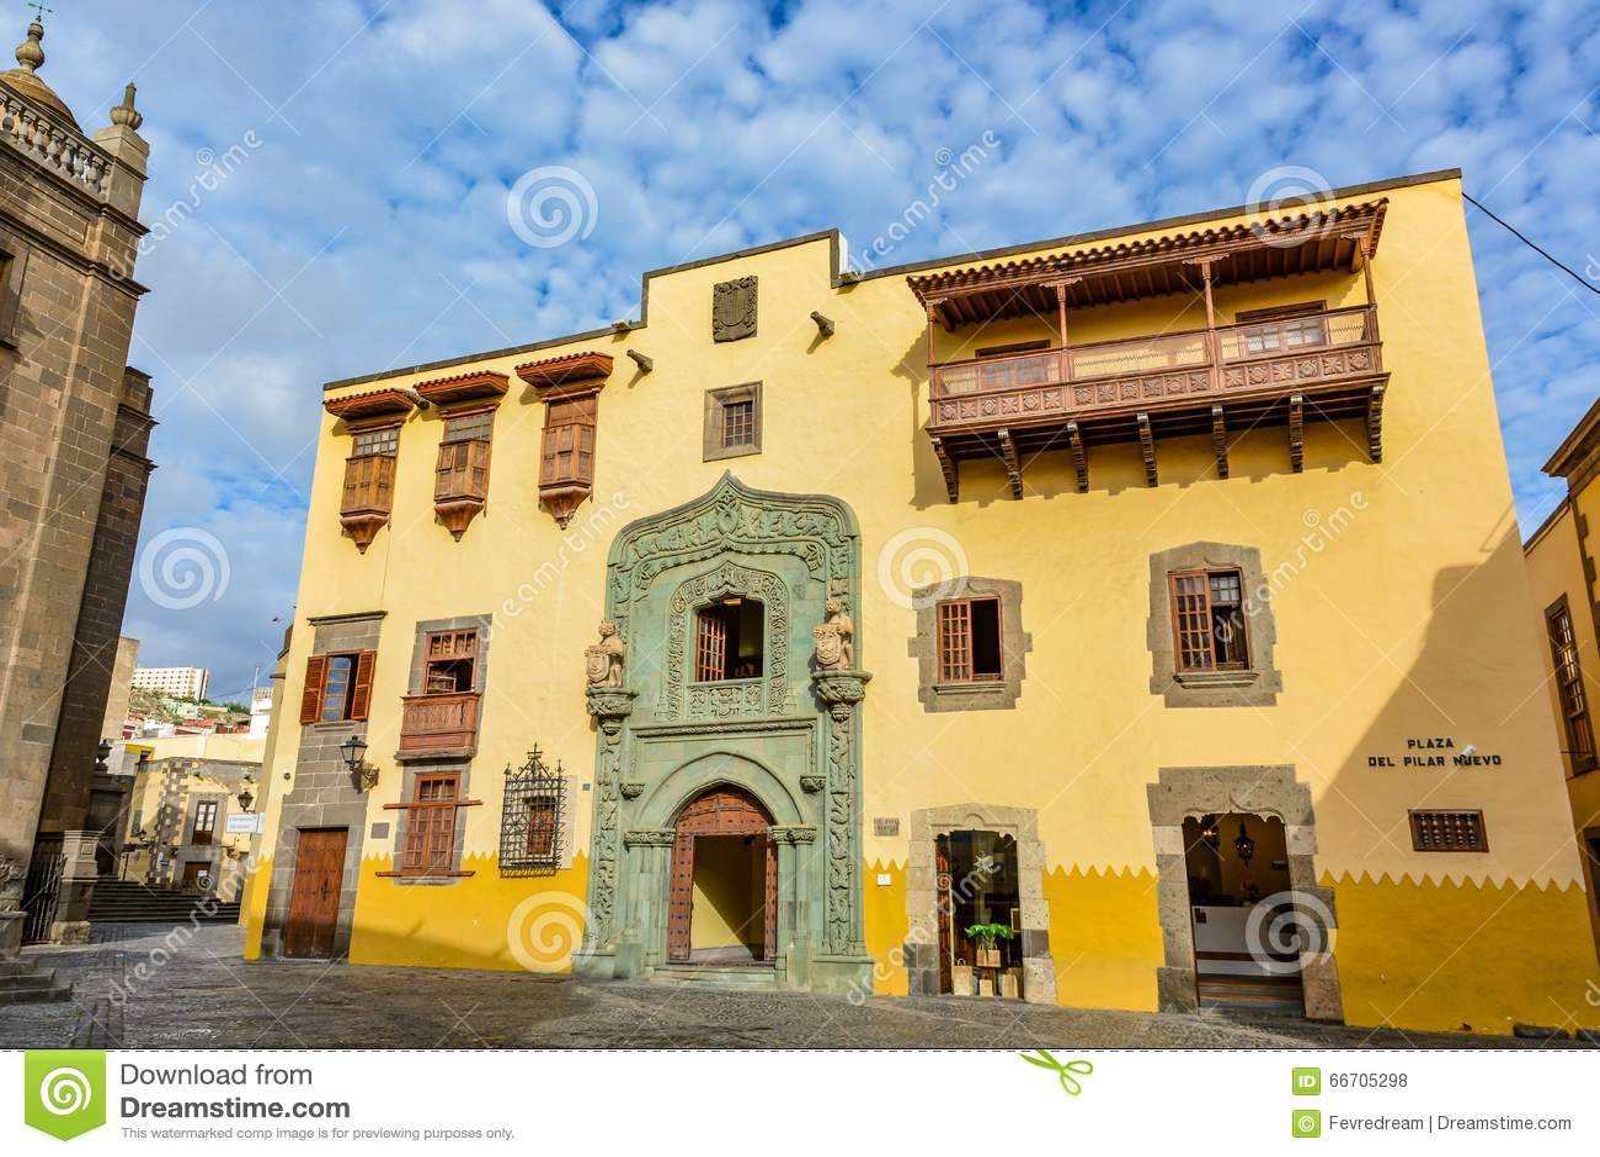 Casa de colon the house of christopher columbus las - Casa activa las palmas ...